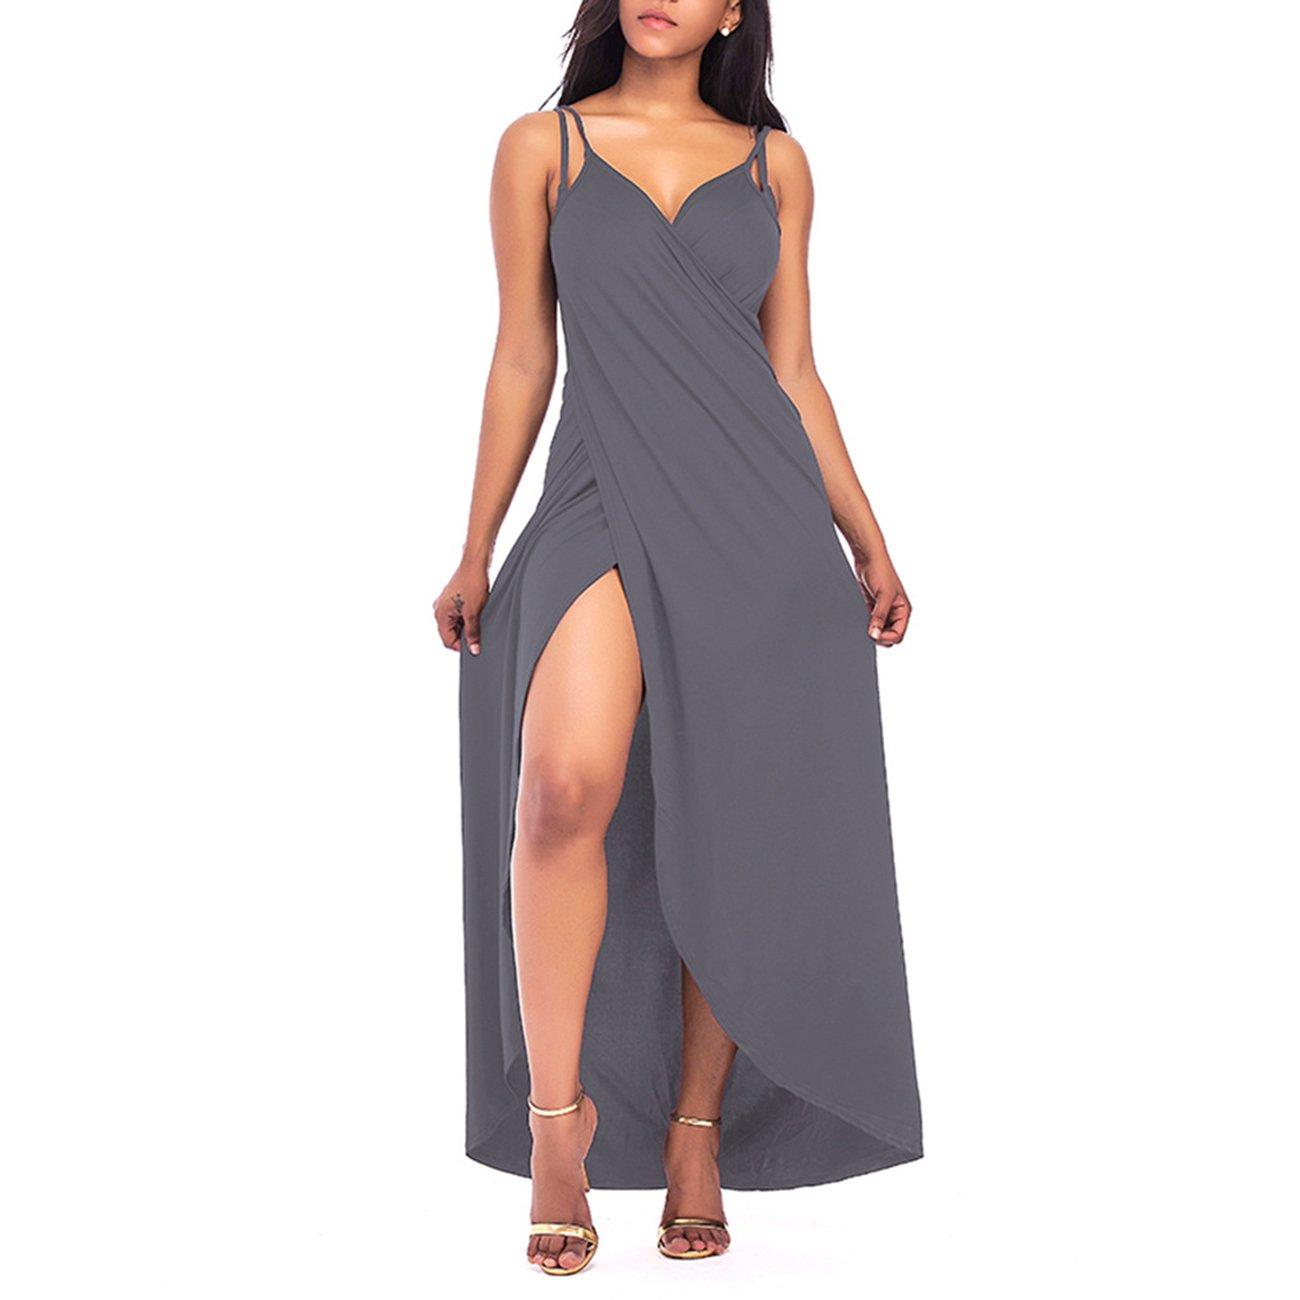 PROMLINK Women's Spaghetti Strap High Slit Backless Bikini Cover Up Beach Dresses